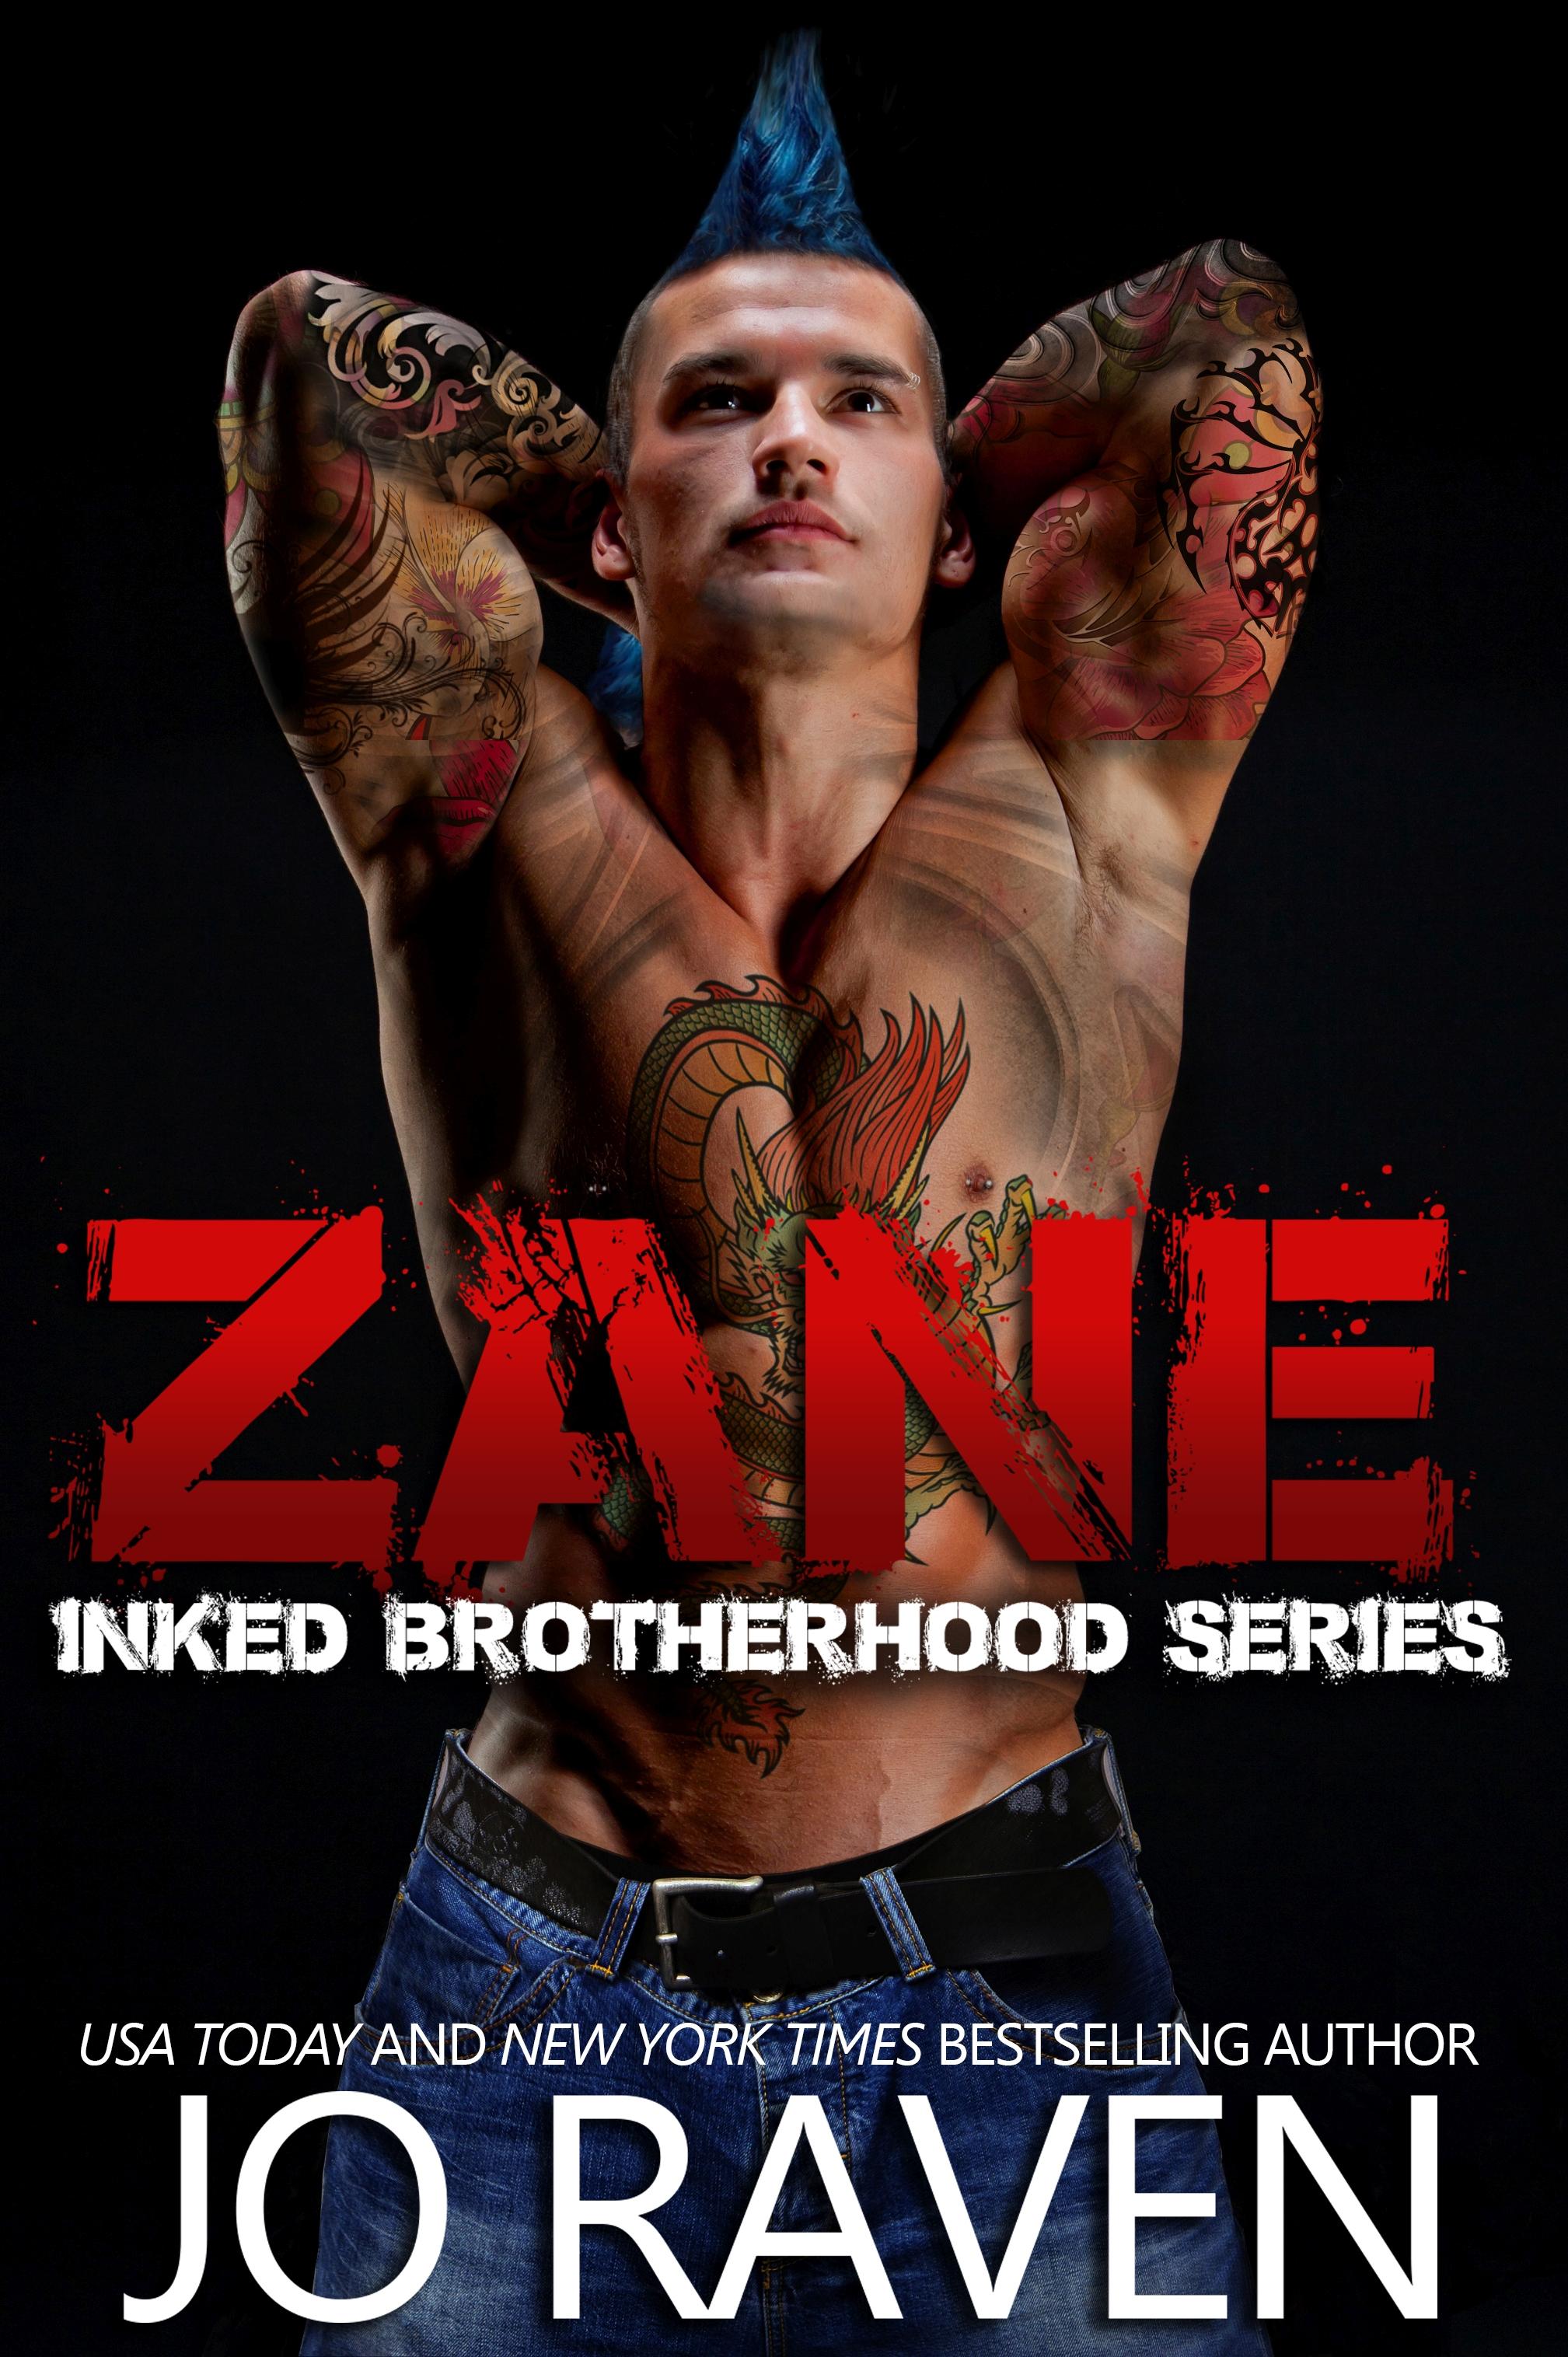 Title: Zane